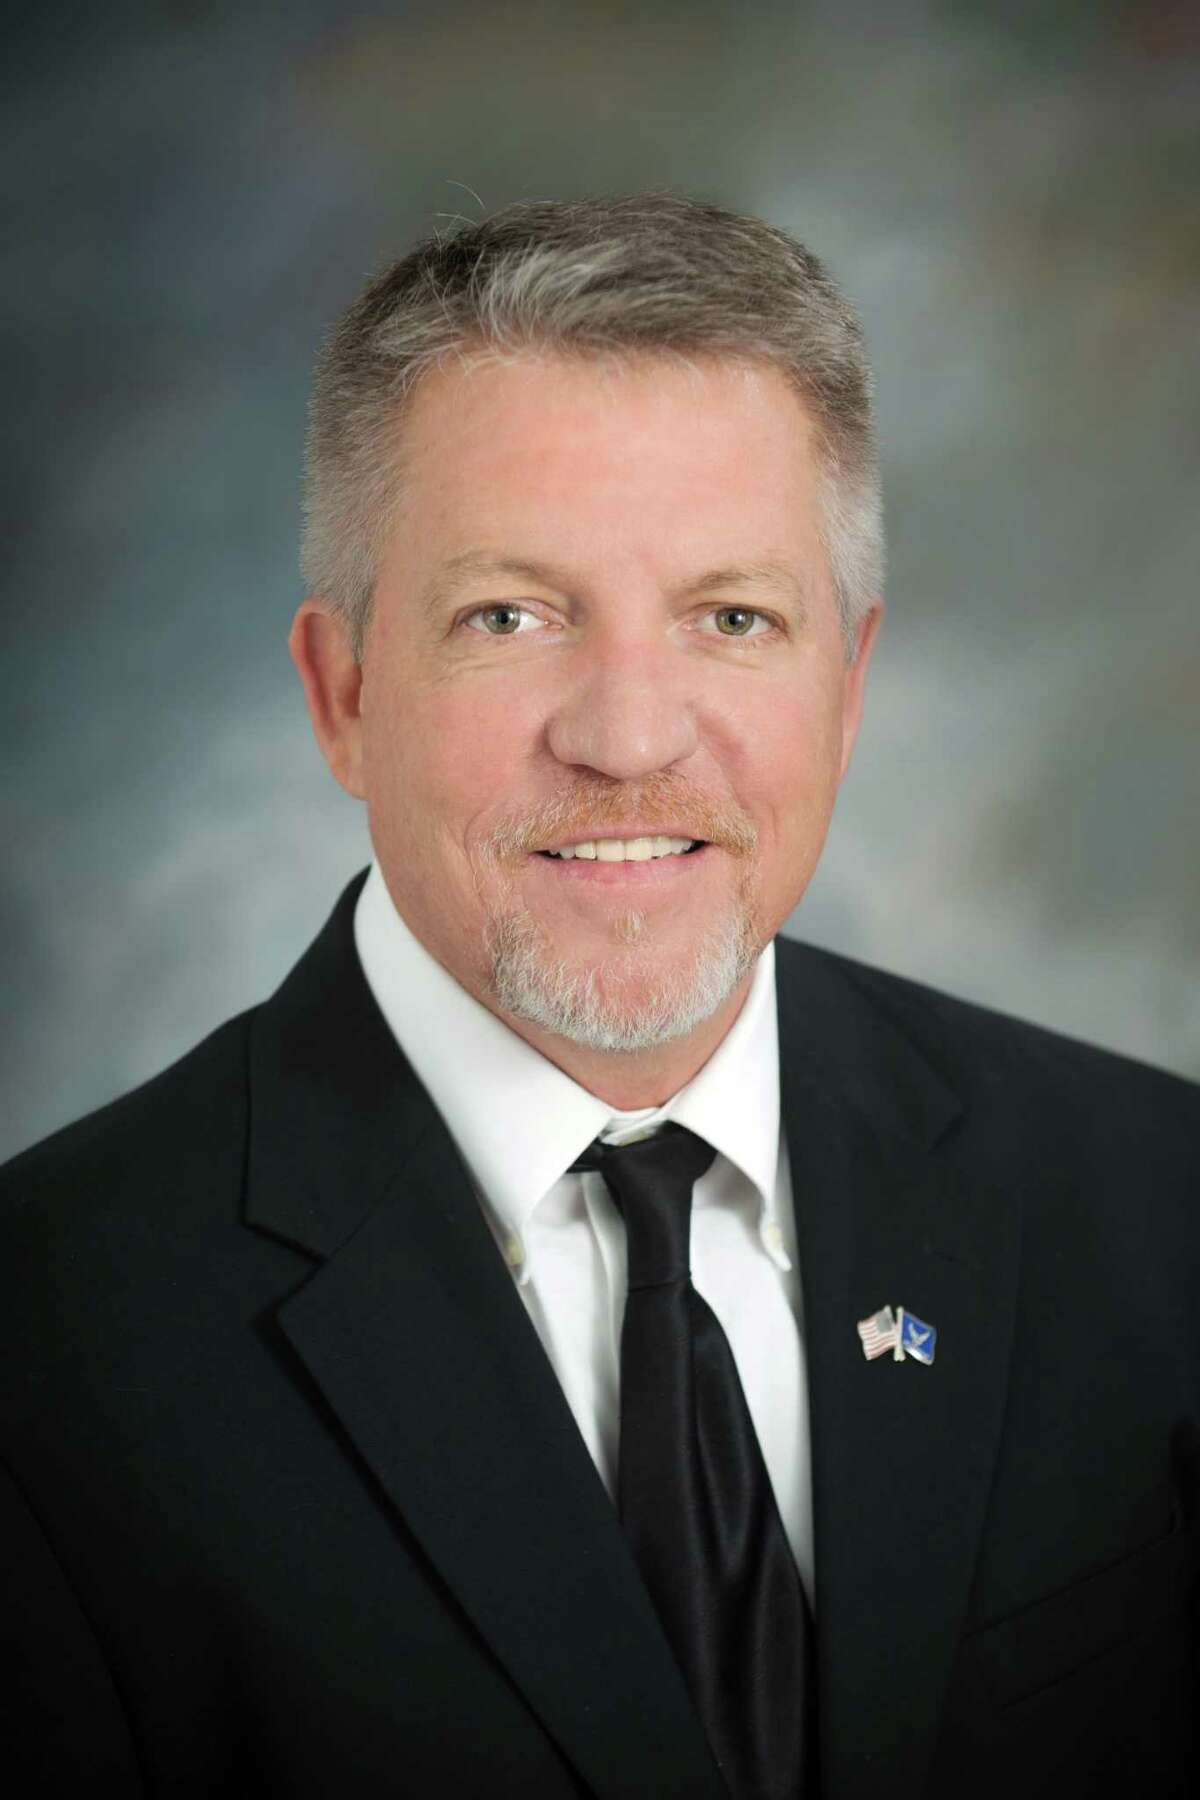 Maxie McGuire, president, Callan Marine, will speak at the Greater Houston Port Bureau meeting on Thursday.